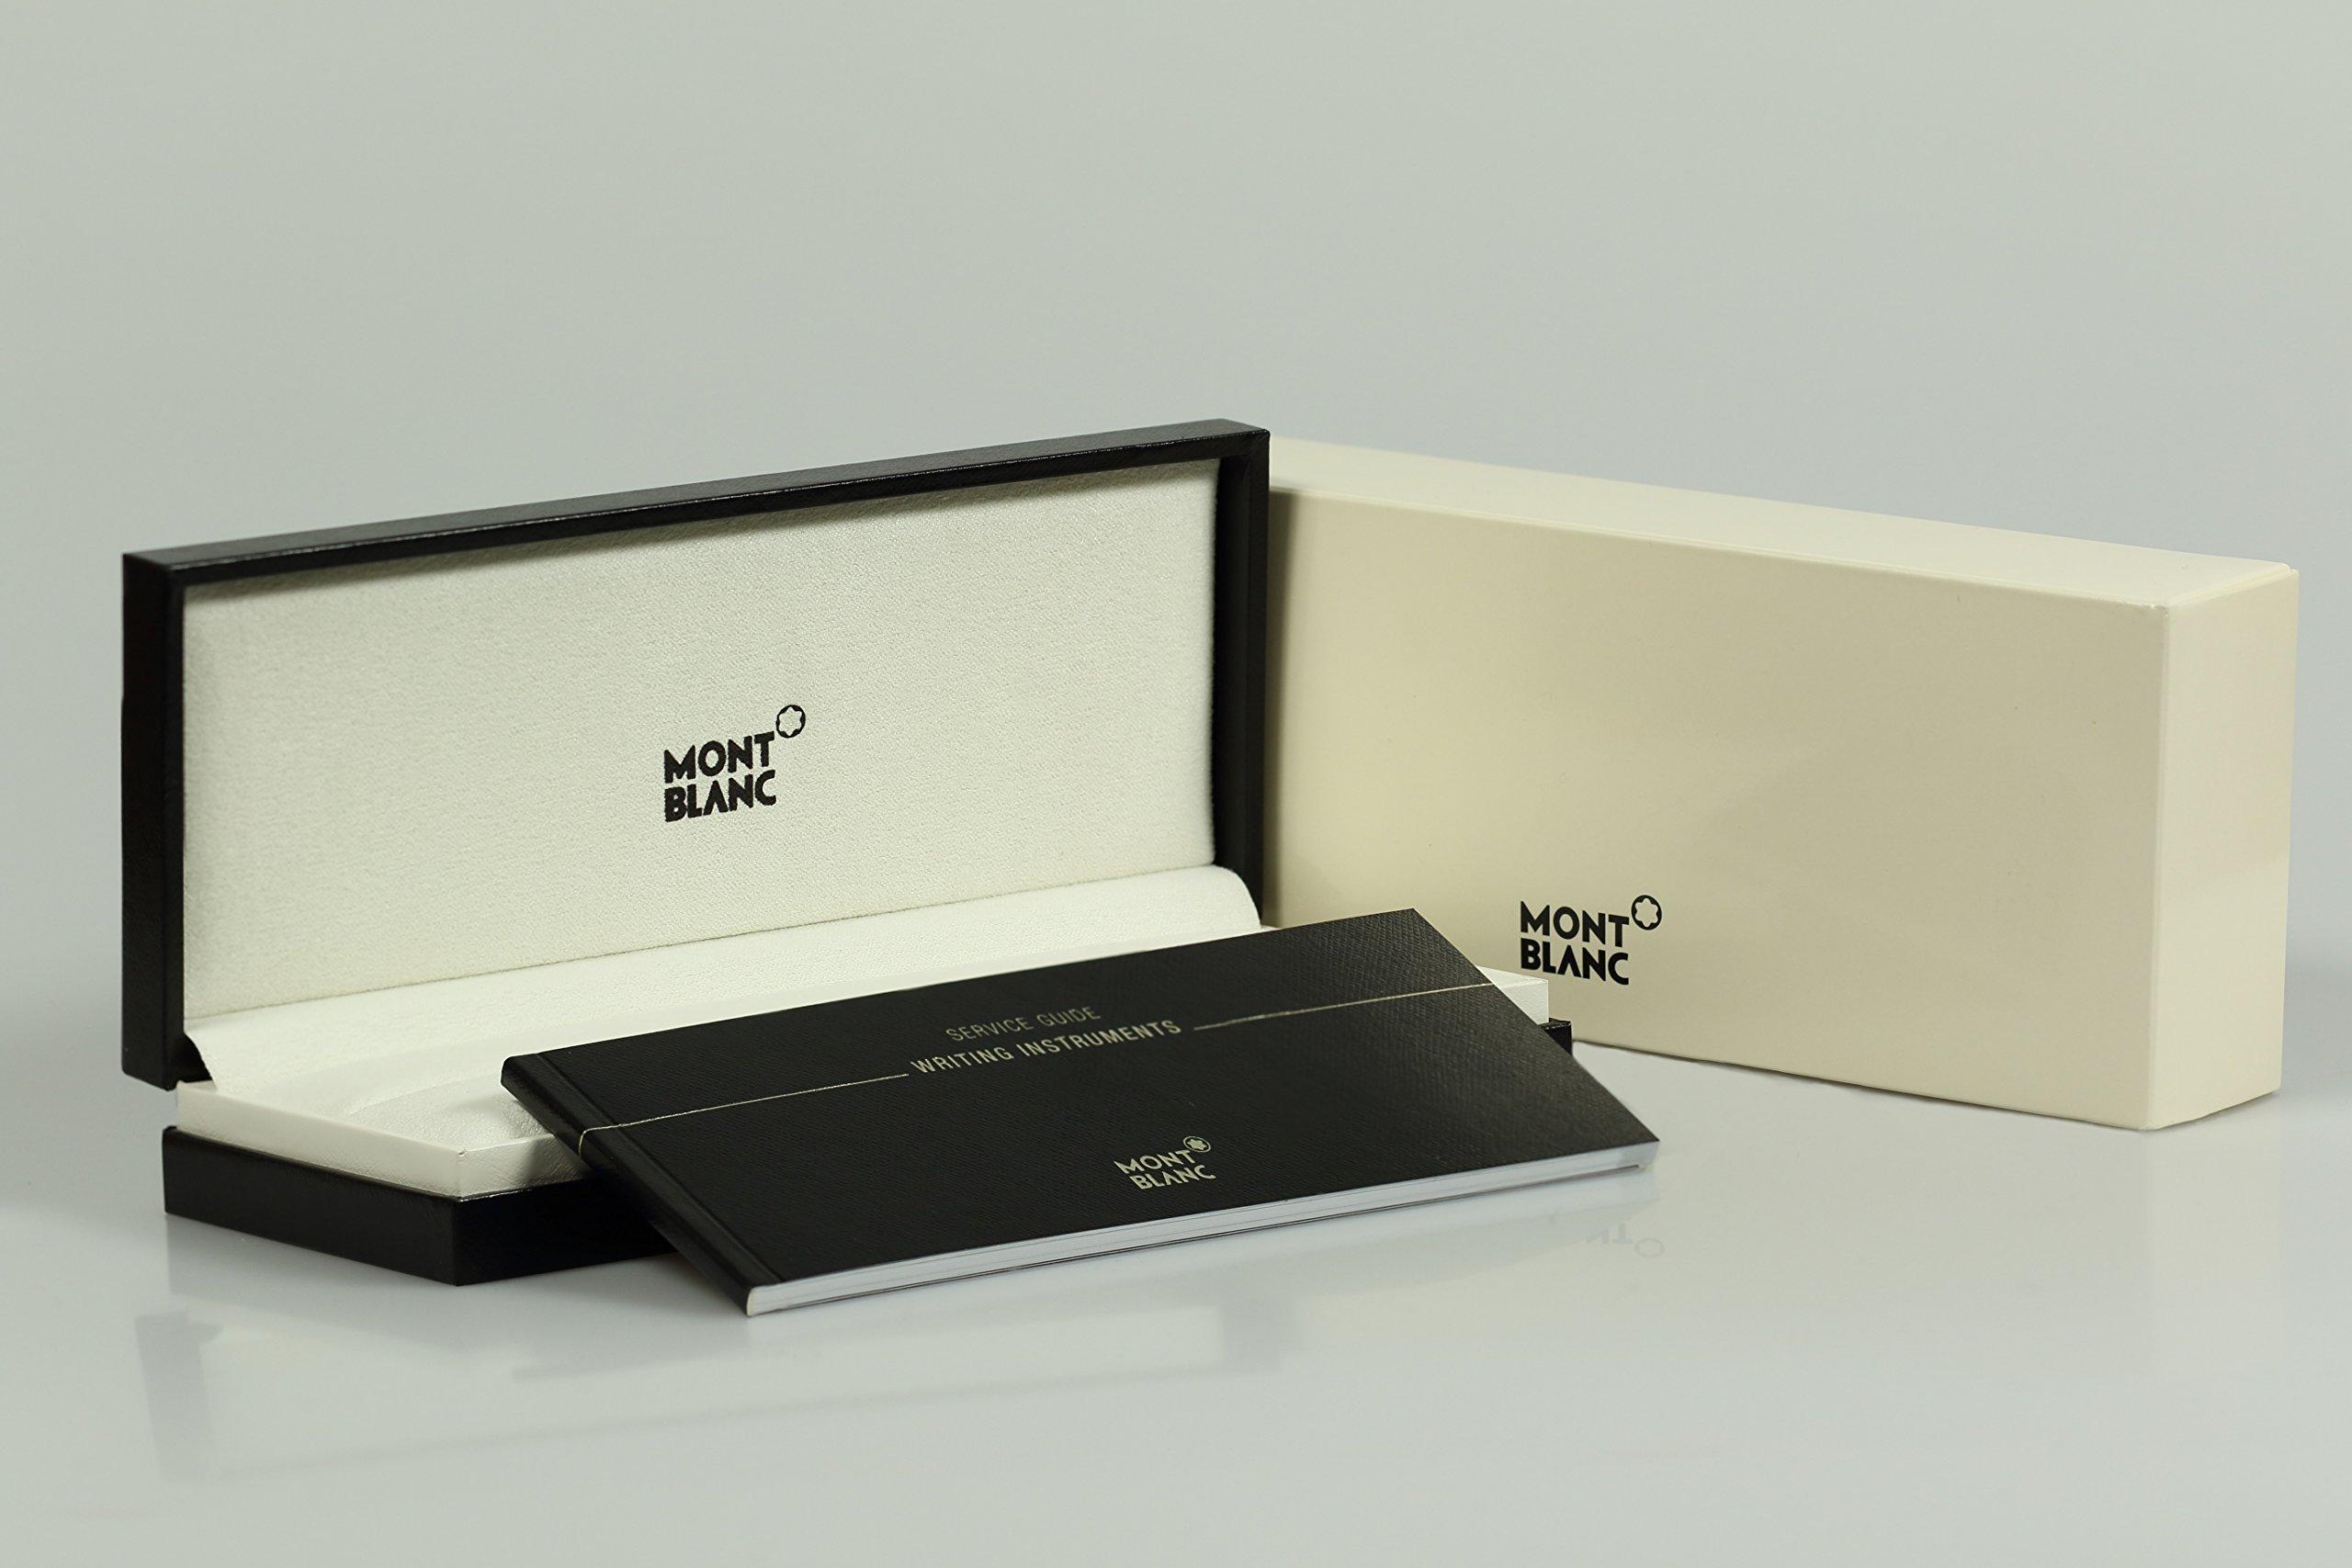 Montblanc PIX White Rollerball Pen 114805